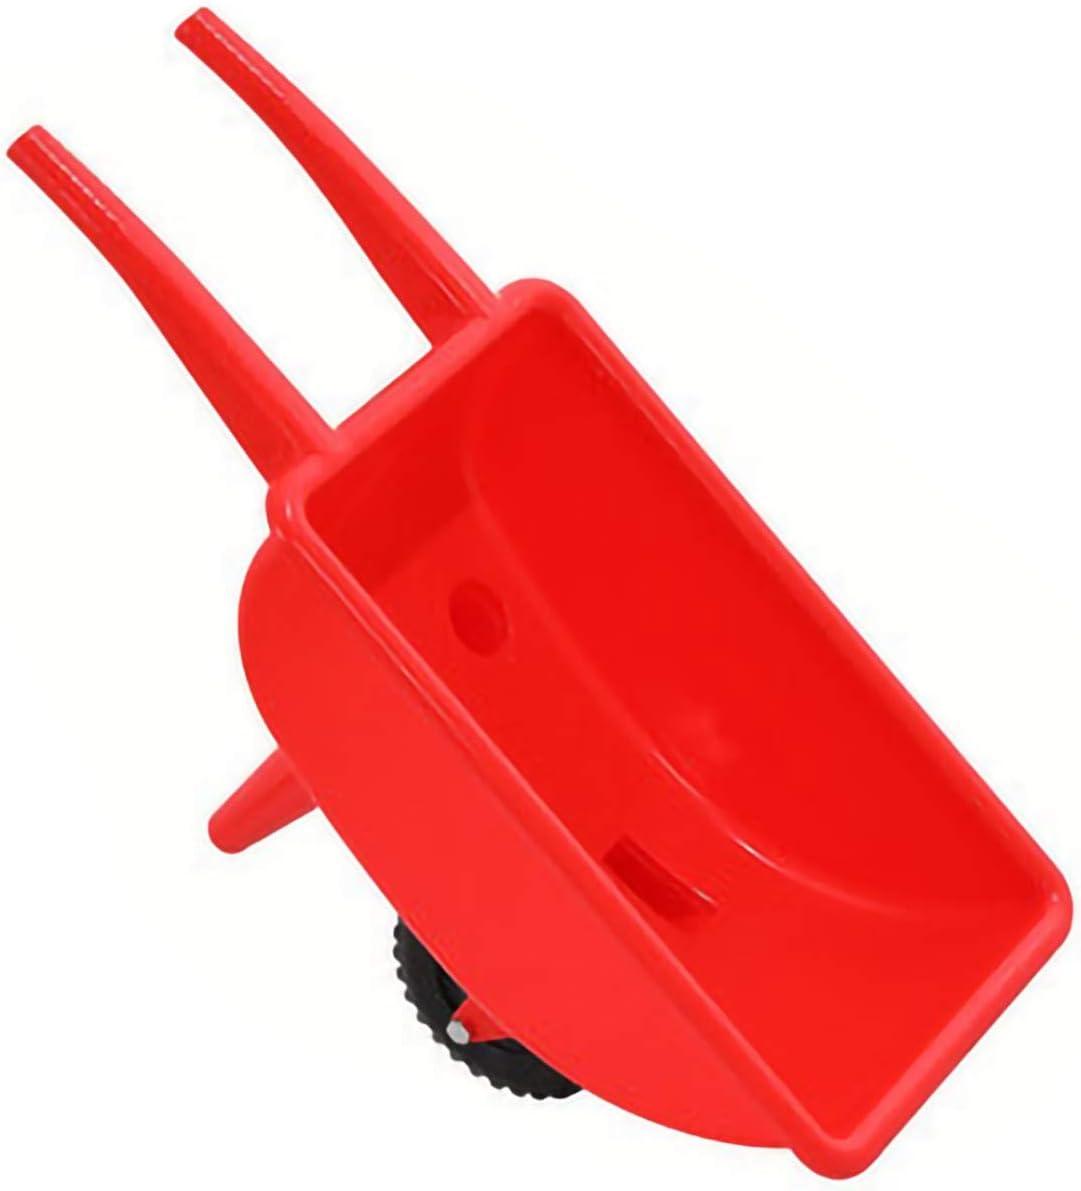 Wheelbarrow Outdoor Toy Max 44% OFF Kindergarten Single-Layer Truck Dump Tr Popular shop is the lowest price challenge